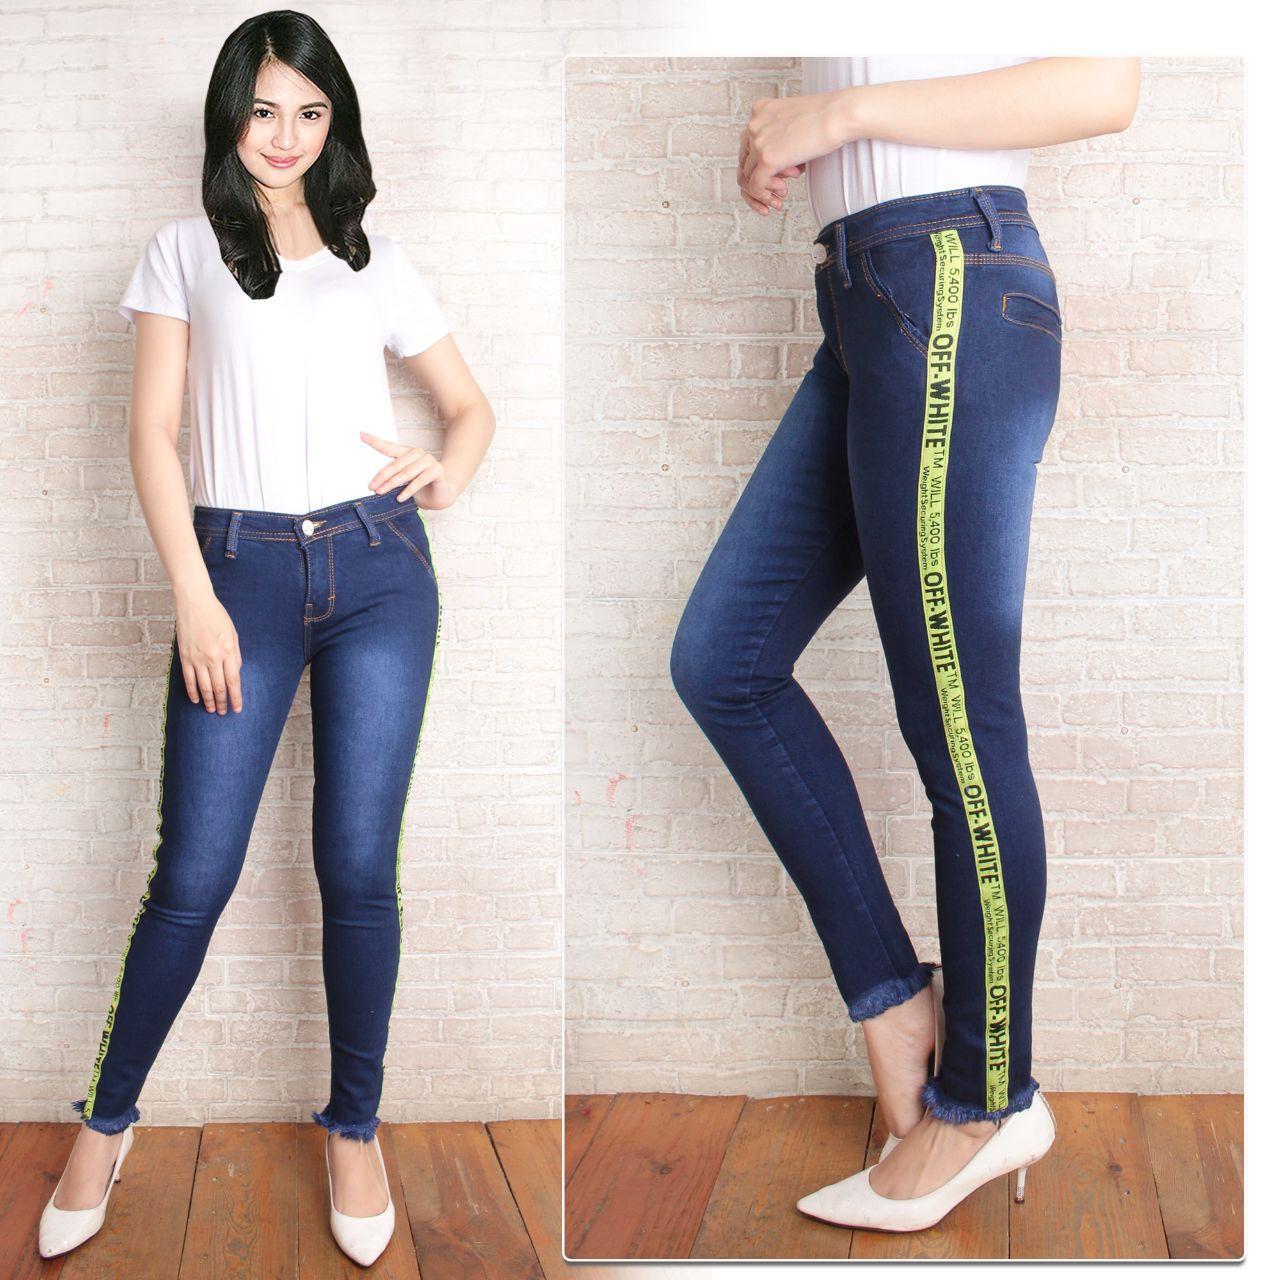 celana jeans wanita PR OFF WHITE rawis terbaru premium